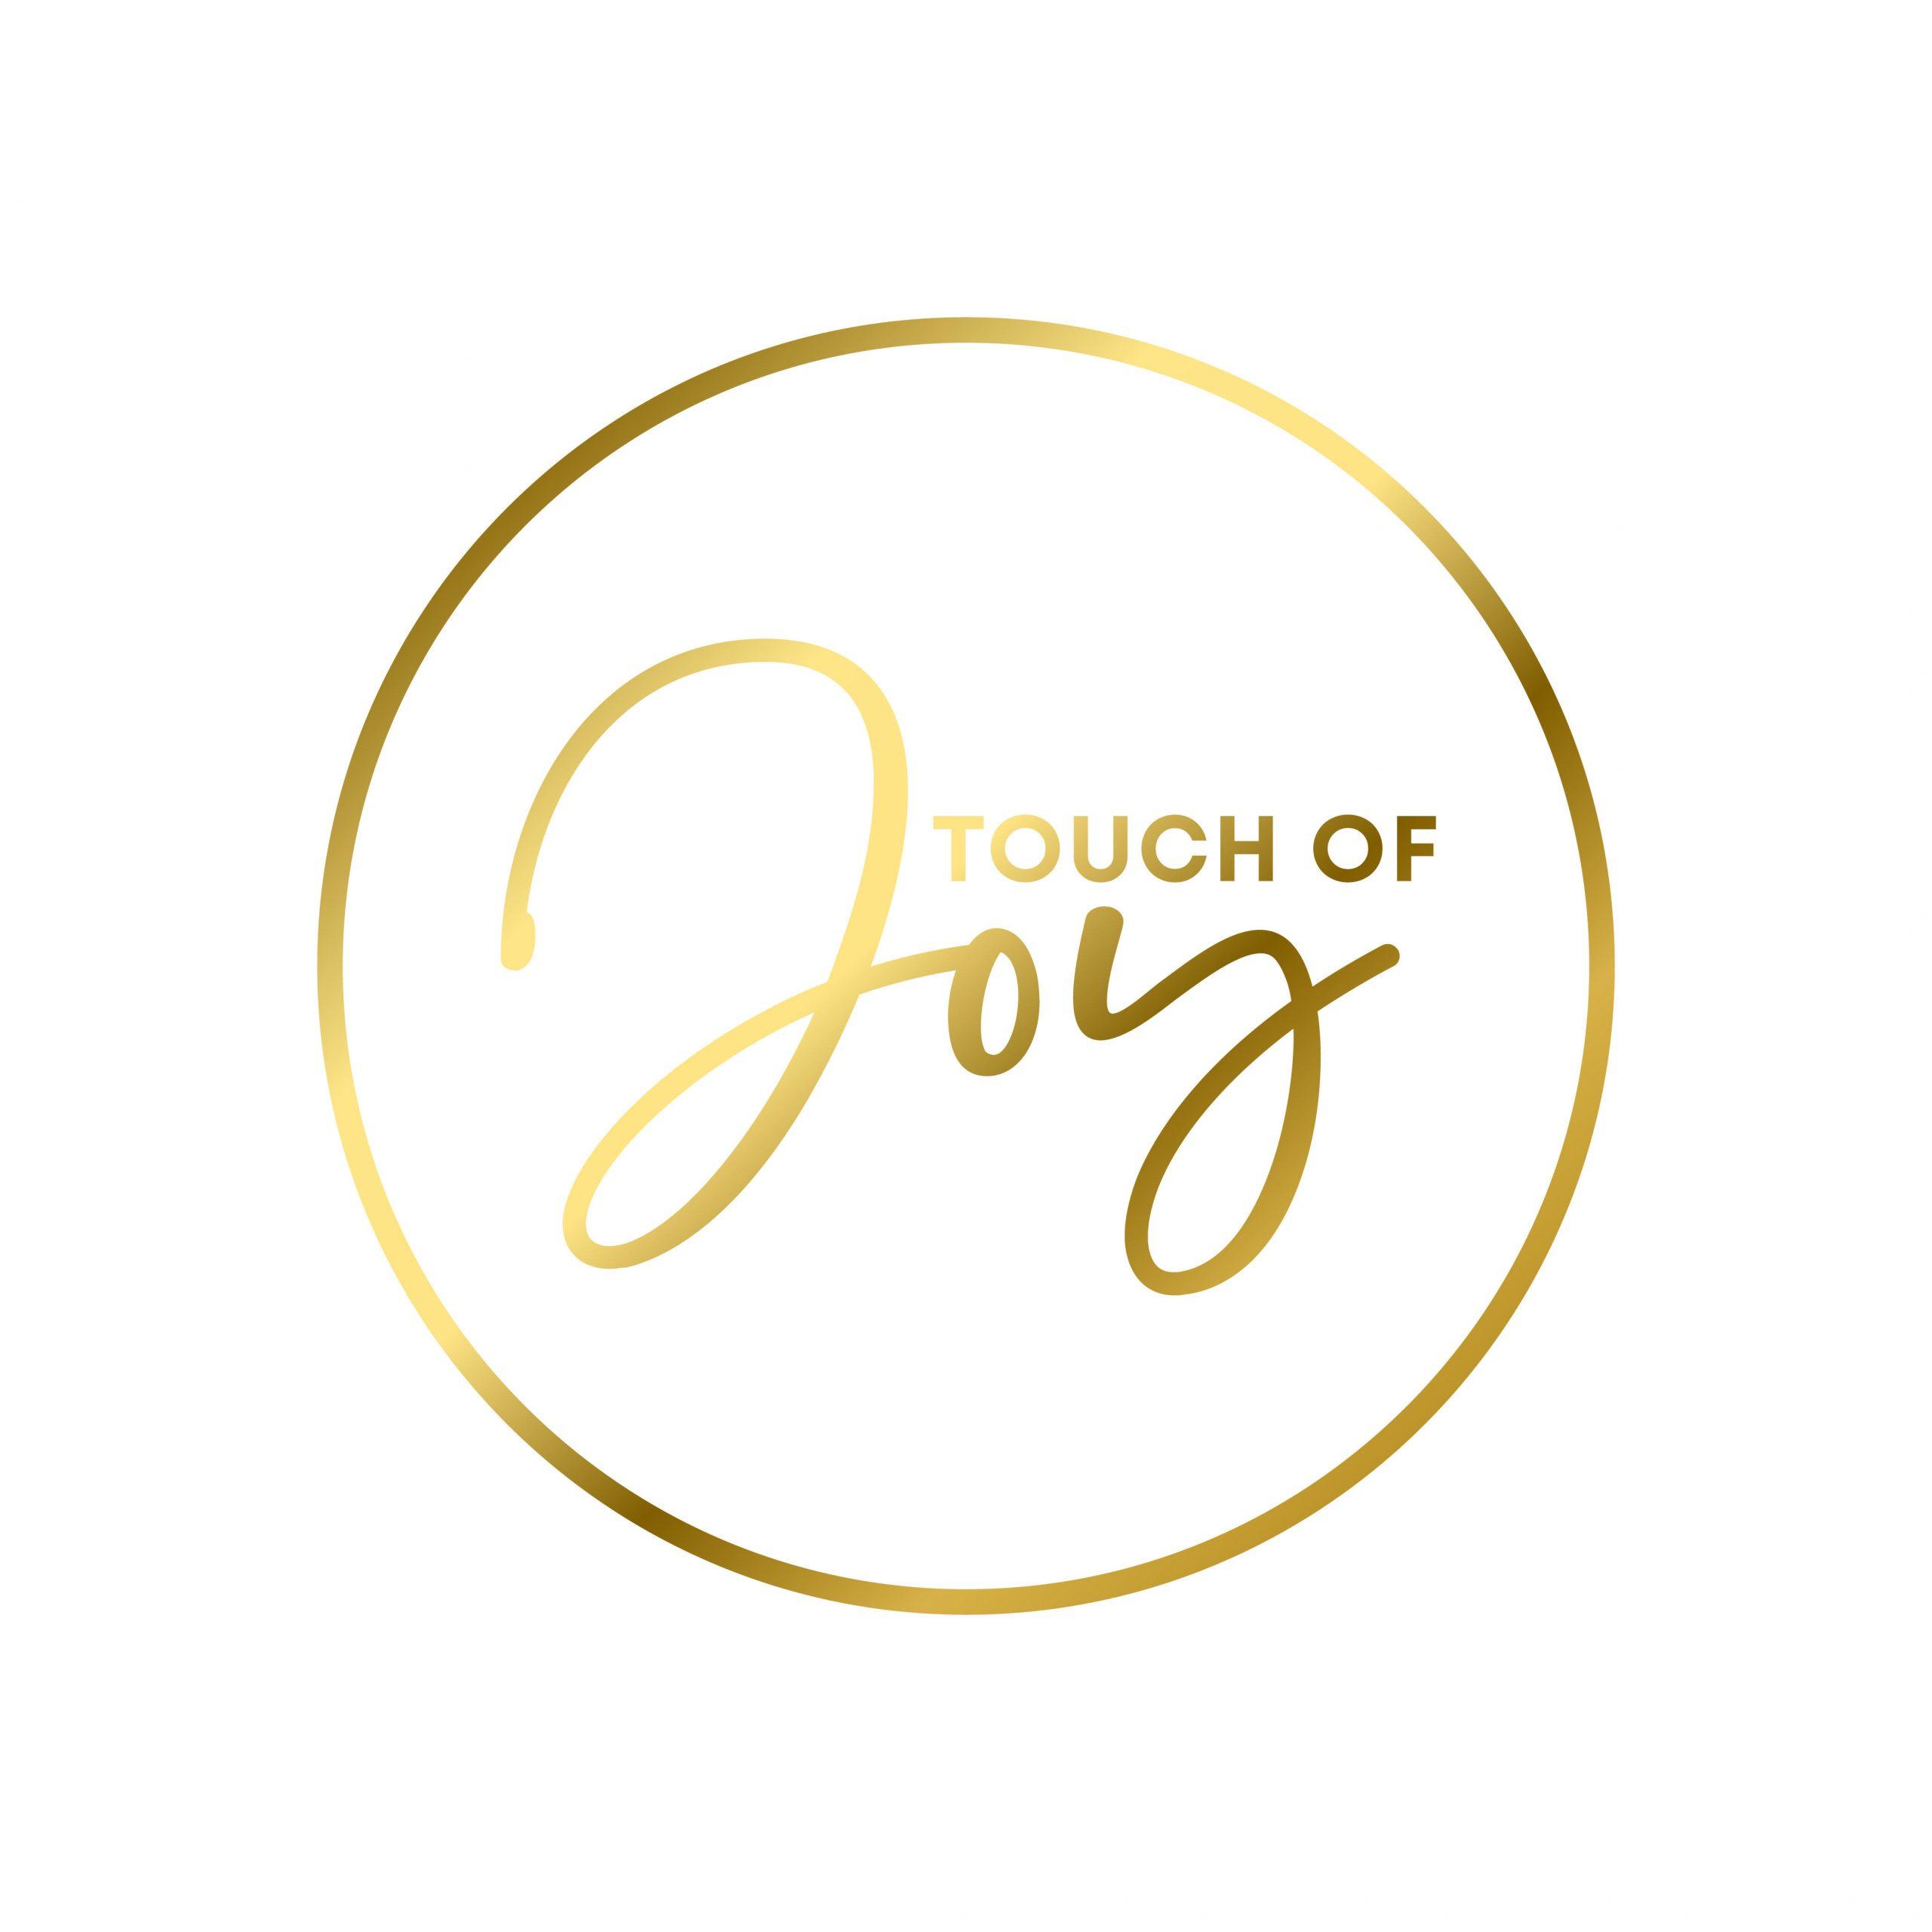 Touch of joy logo 2